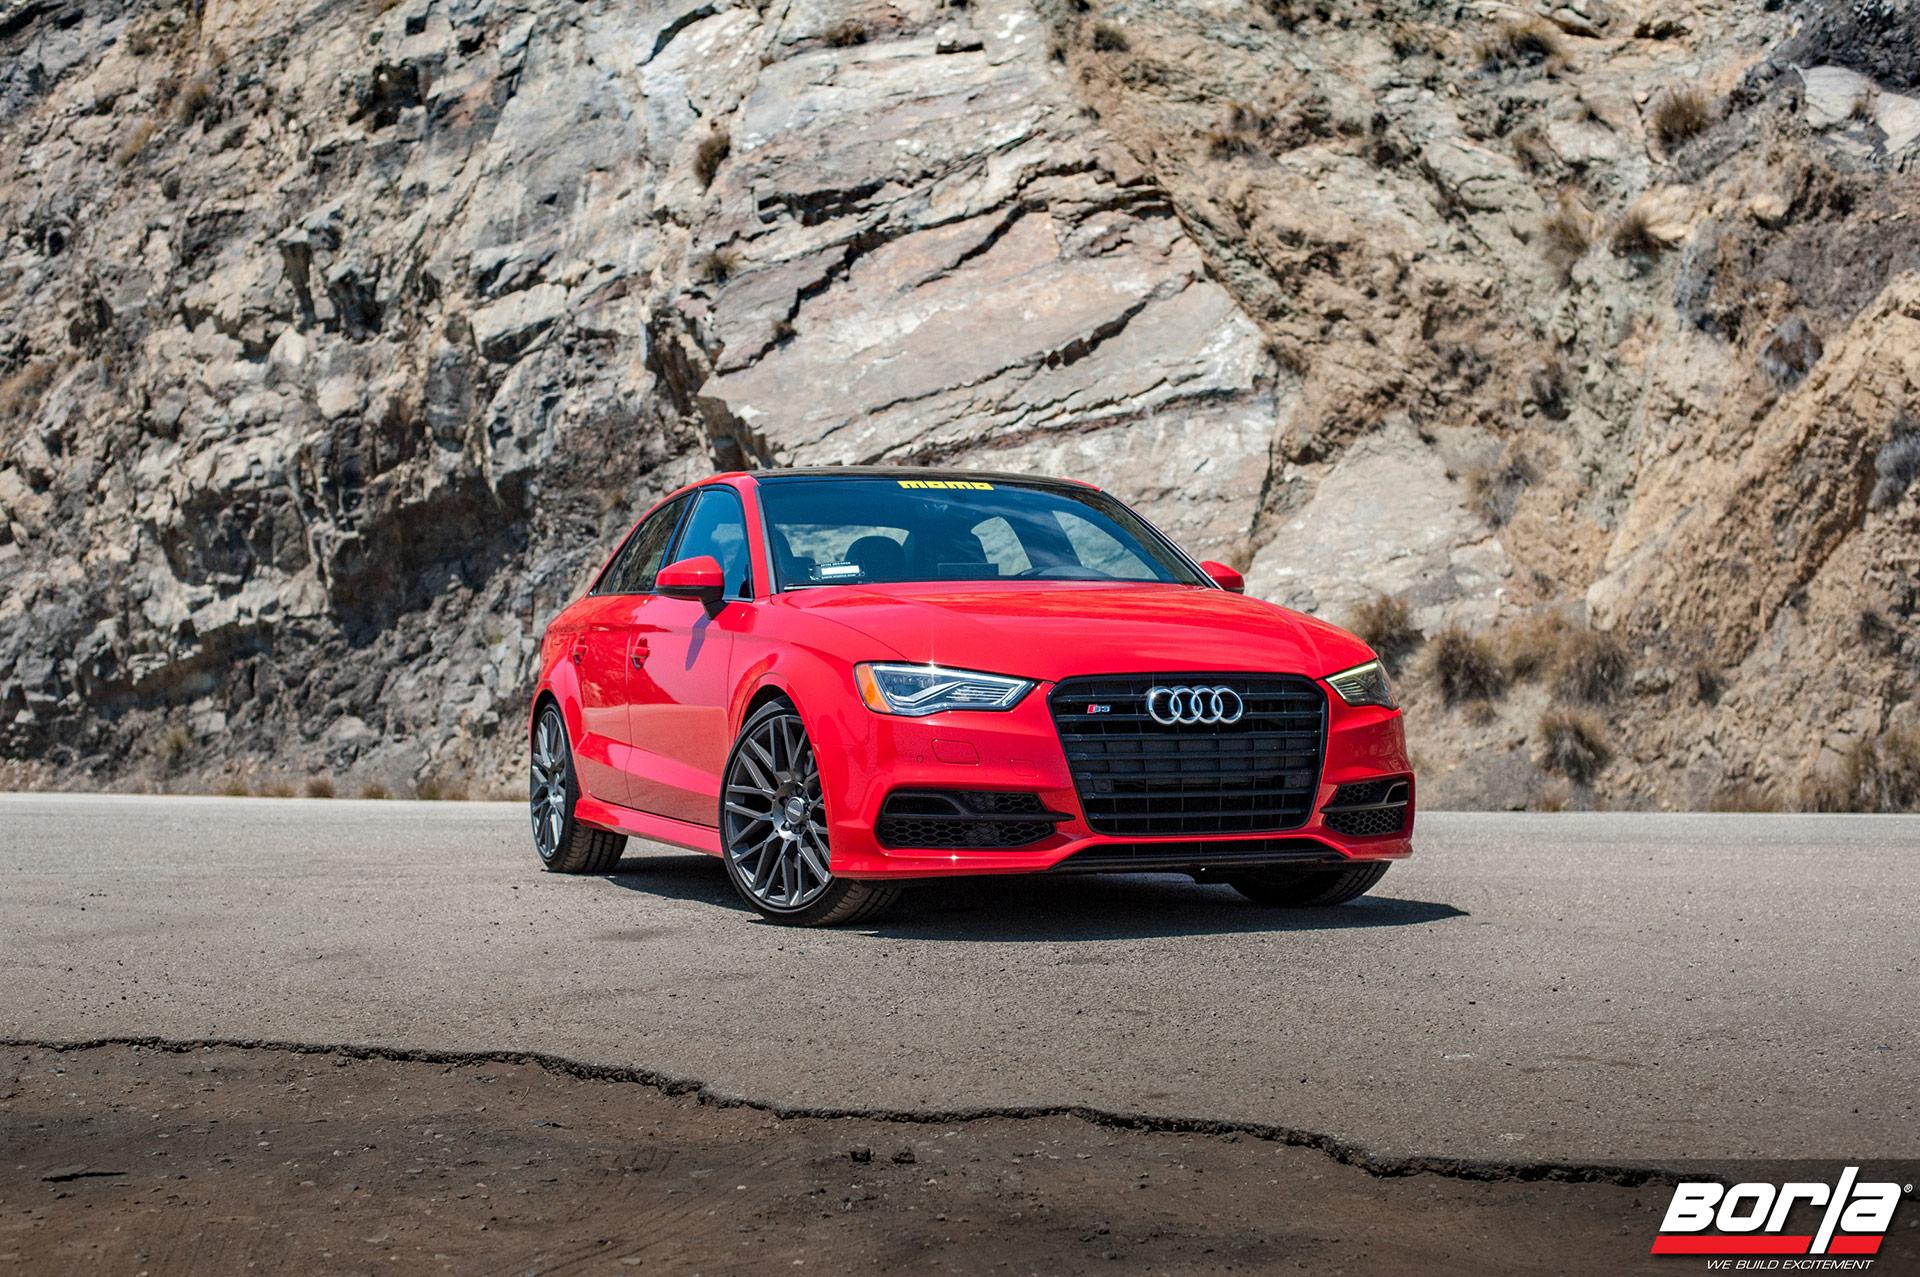 Tango Red Audi S3 Sedan – MOMO Revenge Wheels in Gunmetal